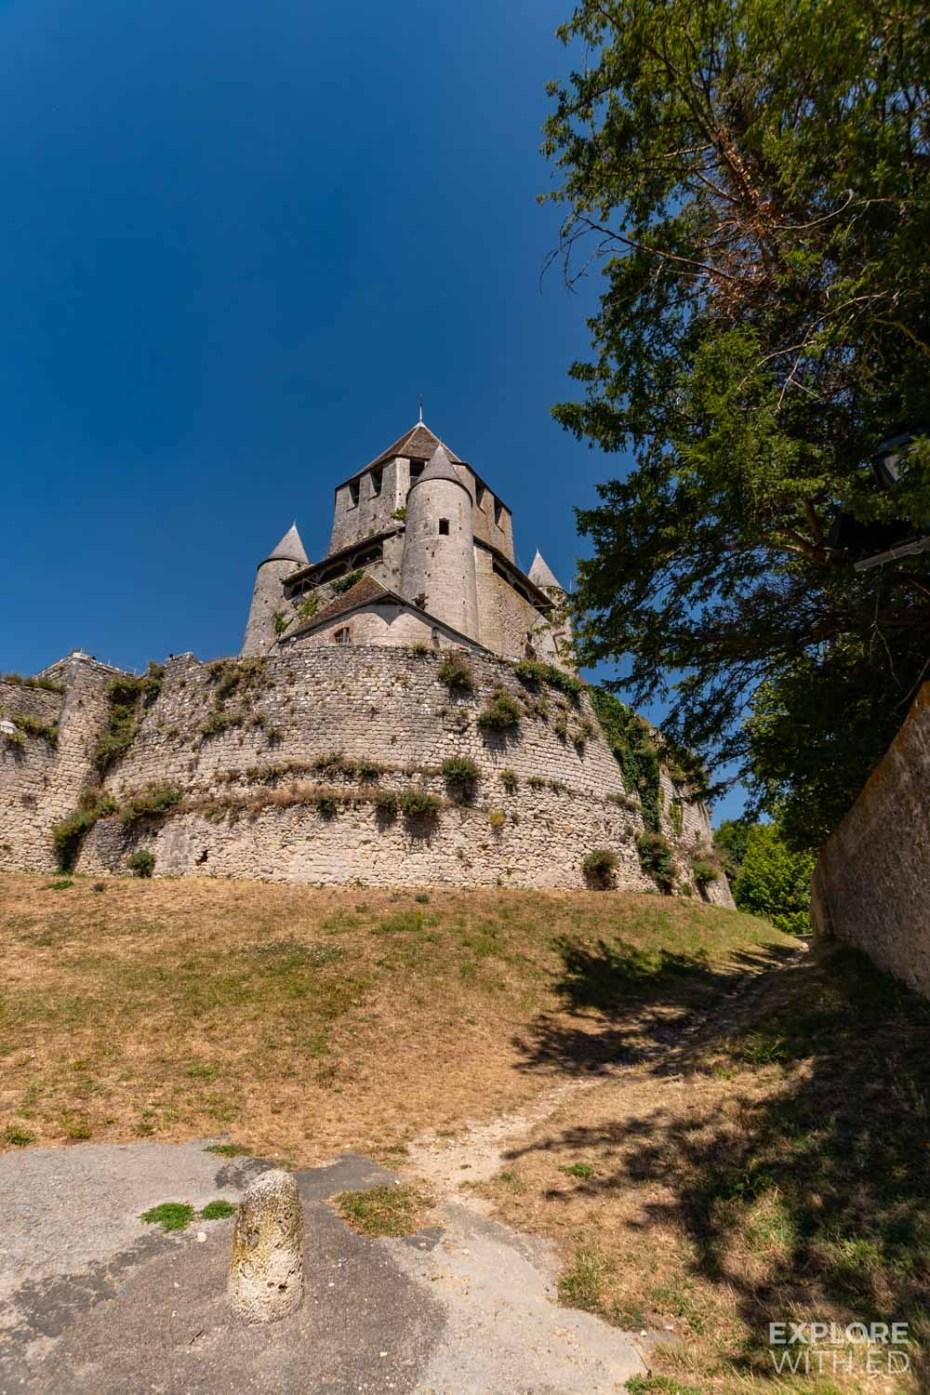 Caesar Tower in Provins, France